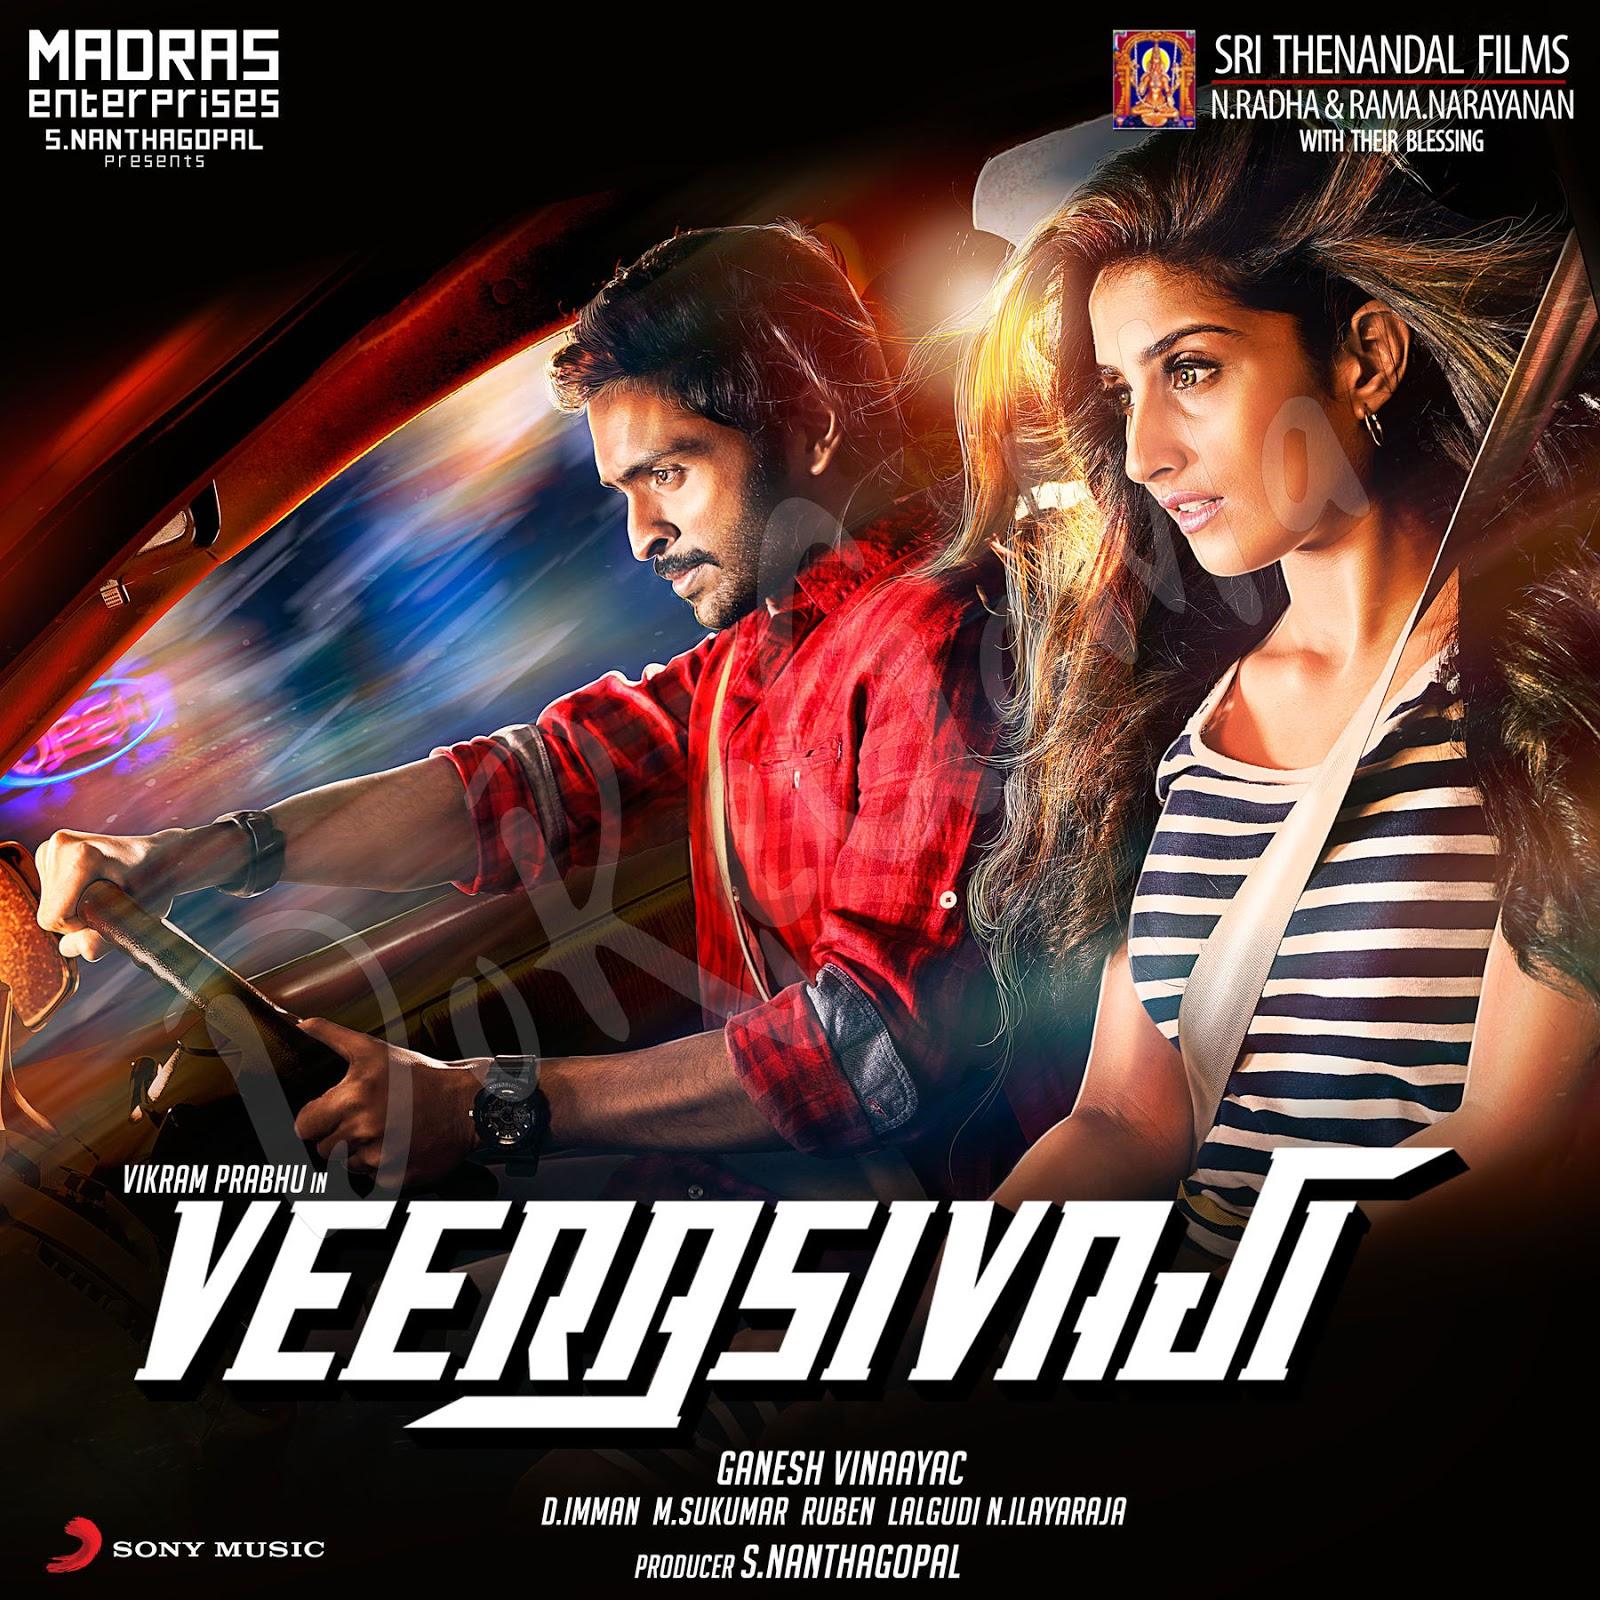 Veera-Sivaji--Tamil-Movie-CD-Front-Cover-Poster-Wallpaper-HD